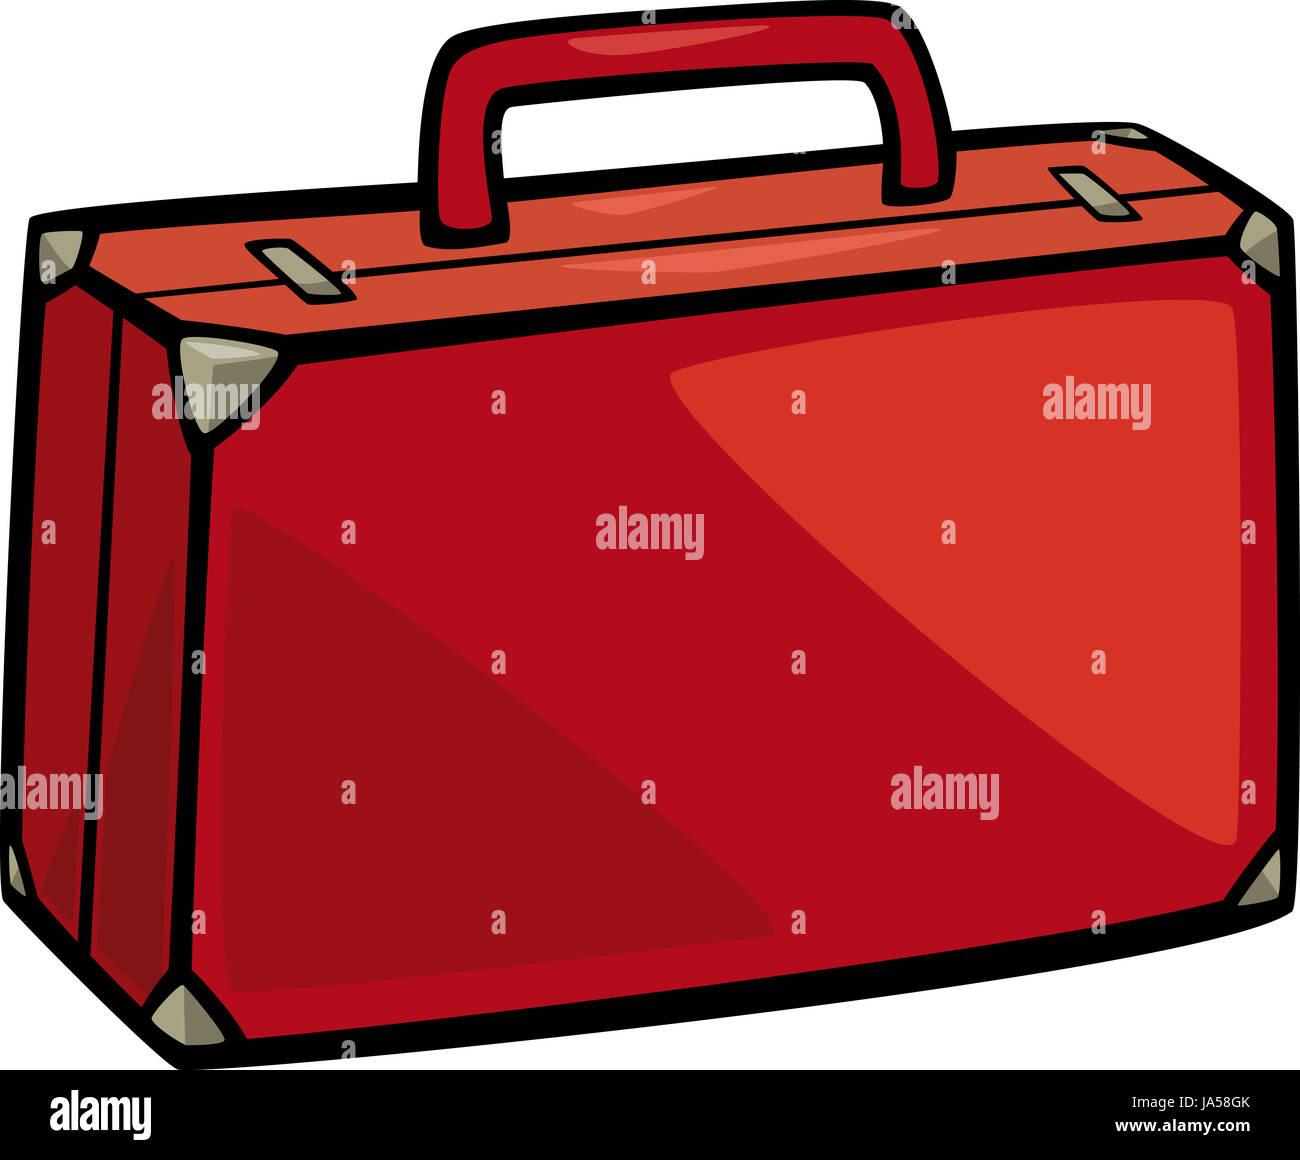 open toolbox clipart. cartoon illustration of suitcase clip art open toolbox clipart